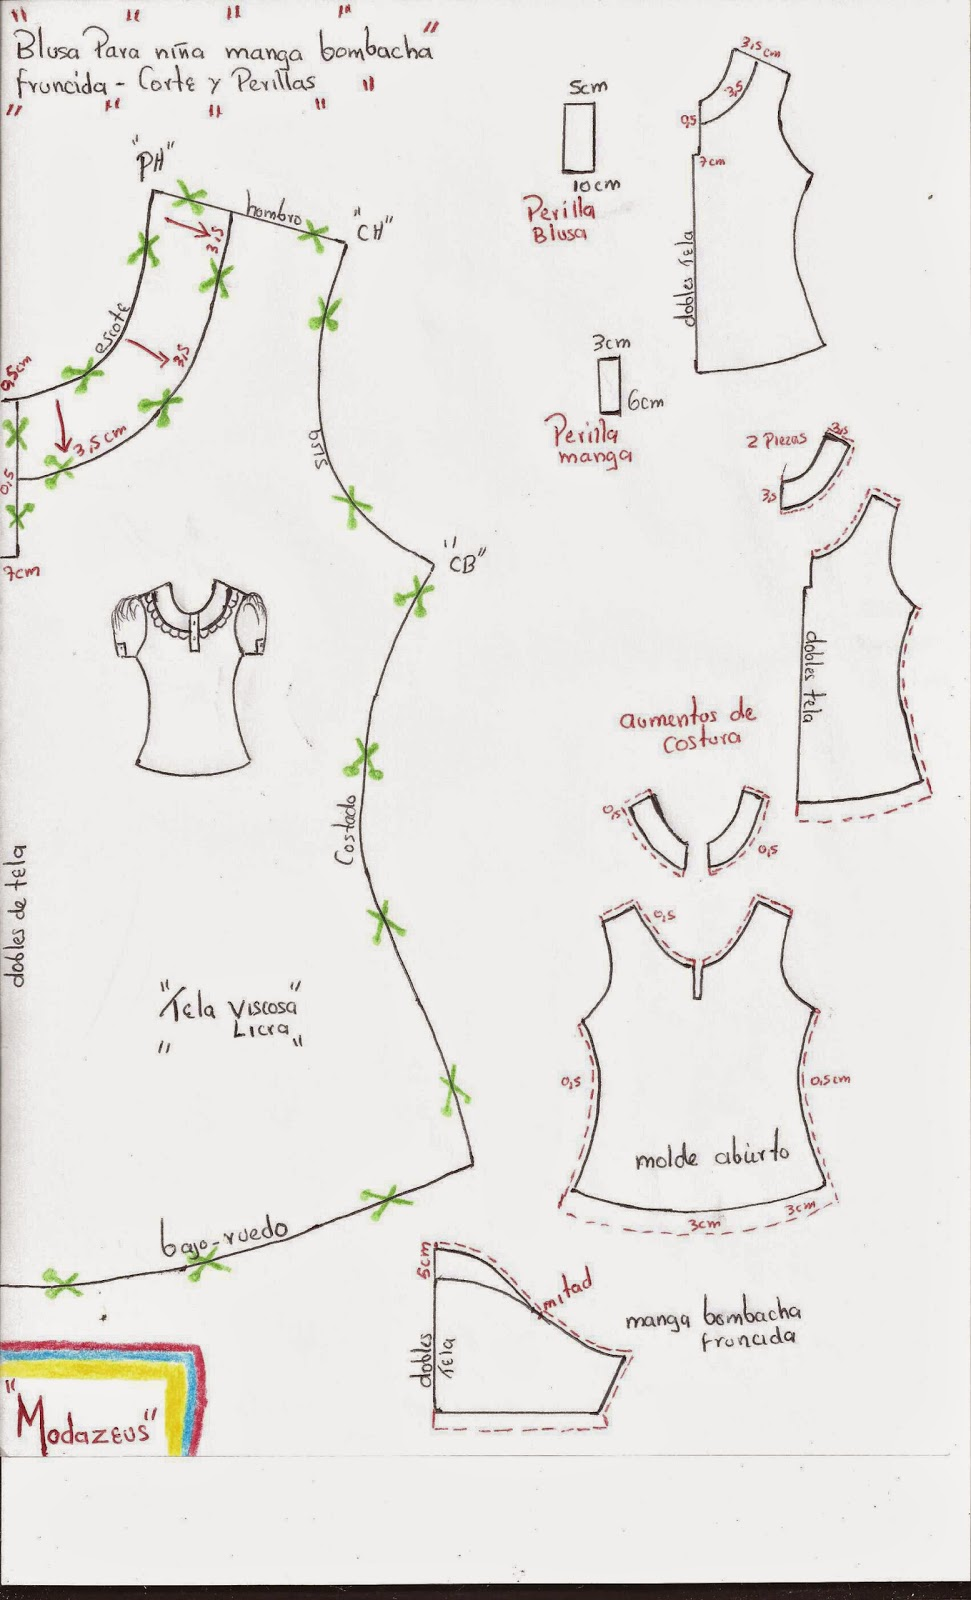 molderia de blusas con manga fruncida y perilla tiras